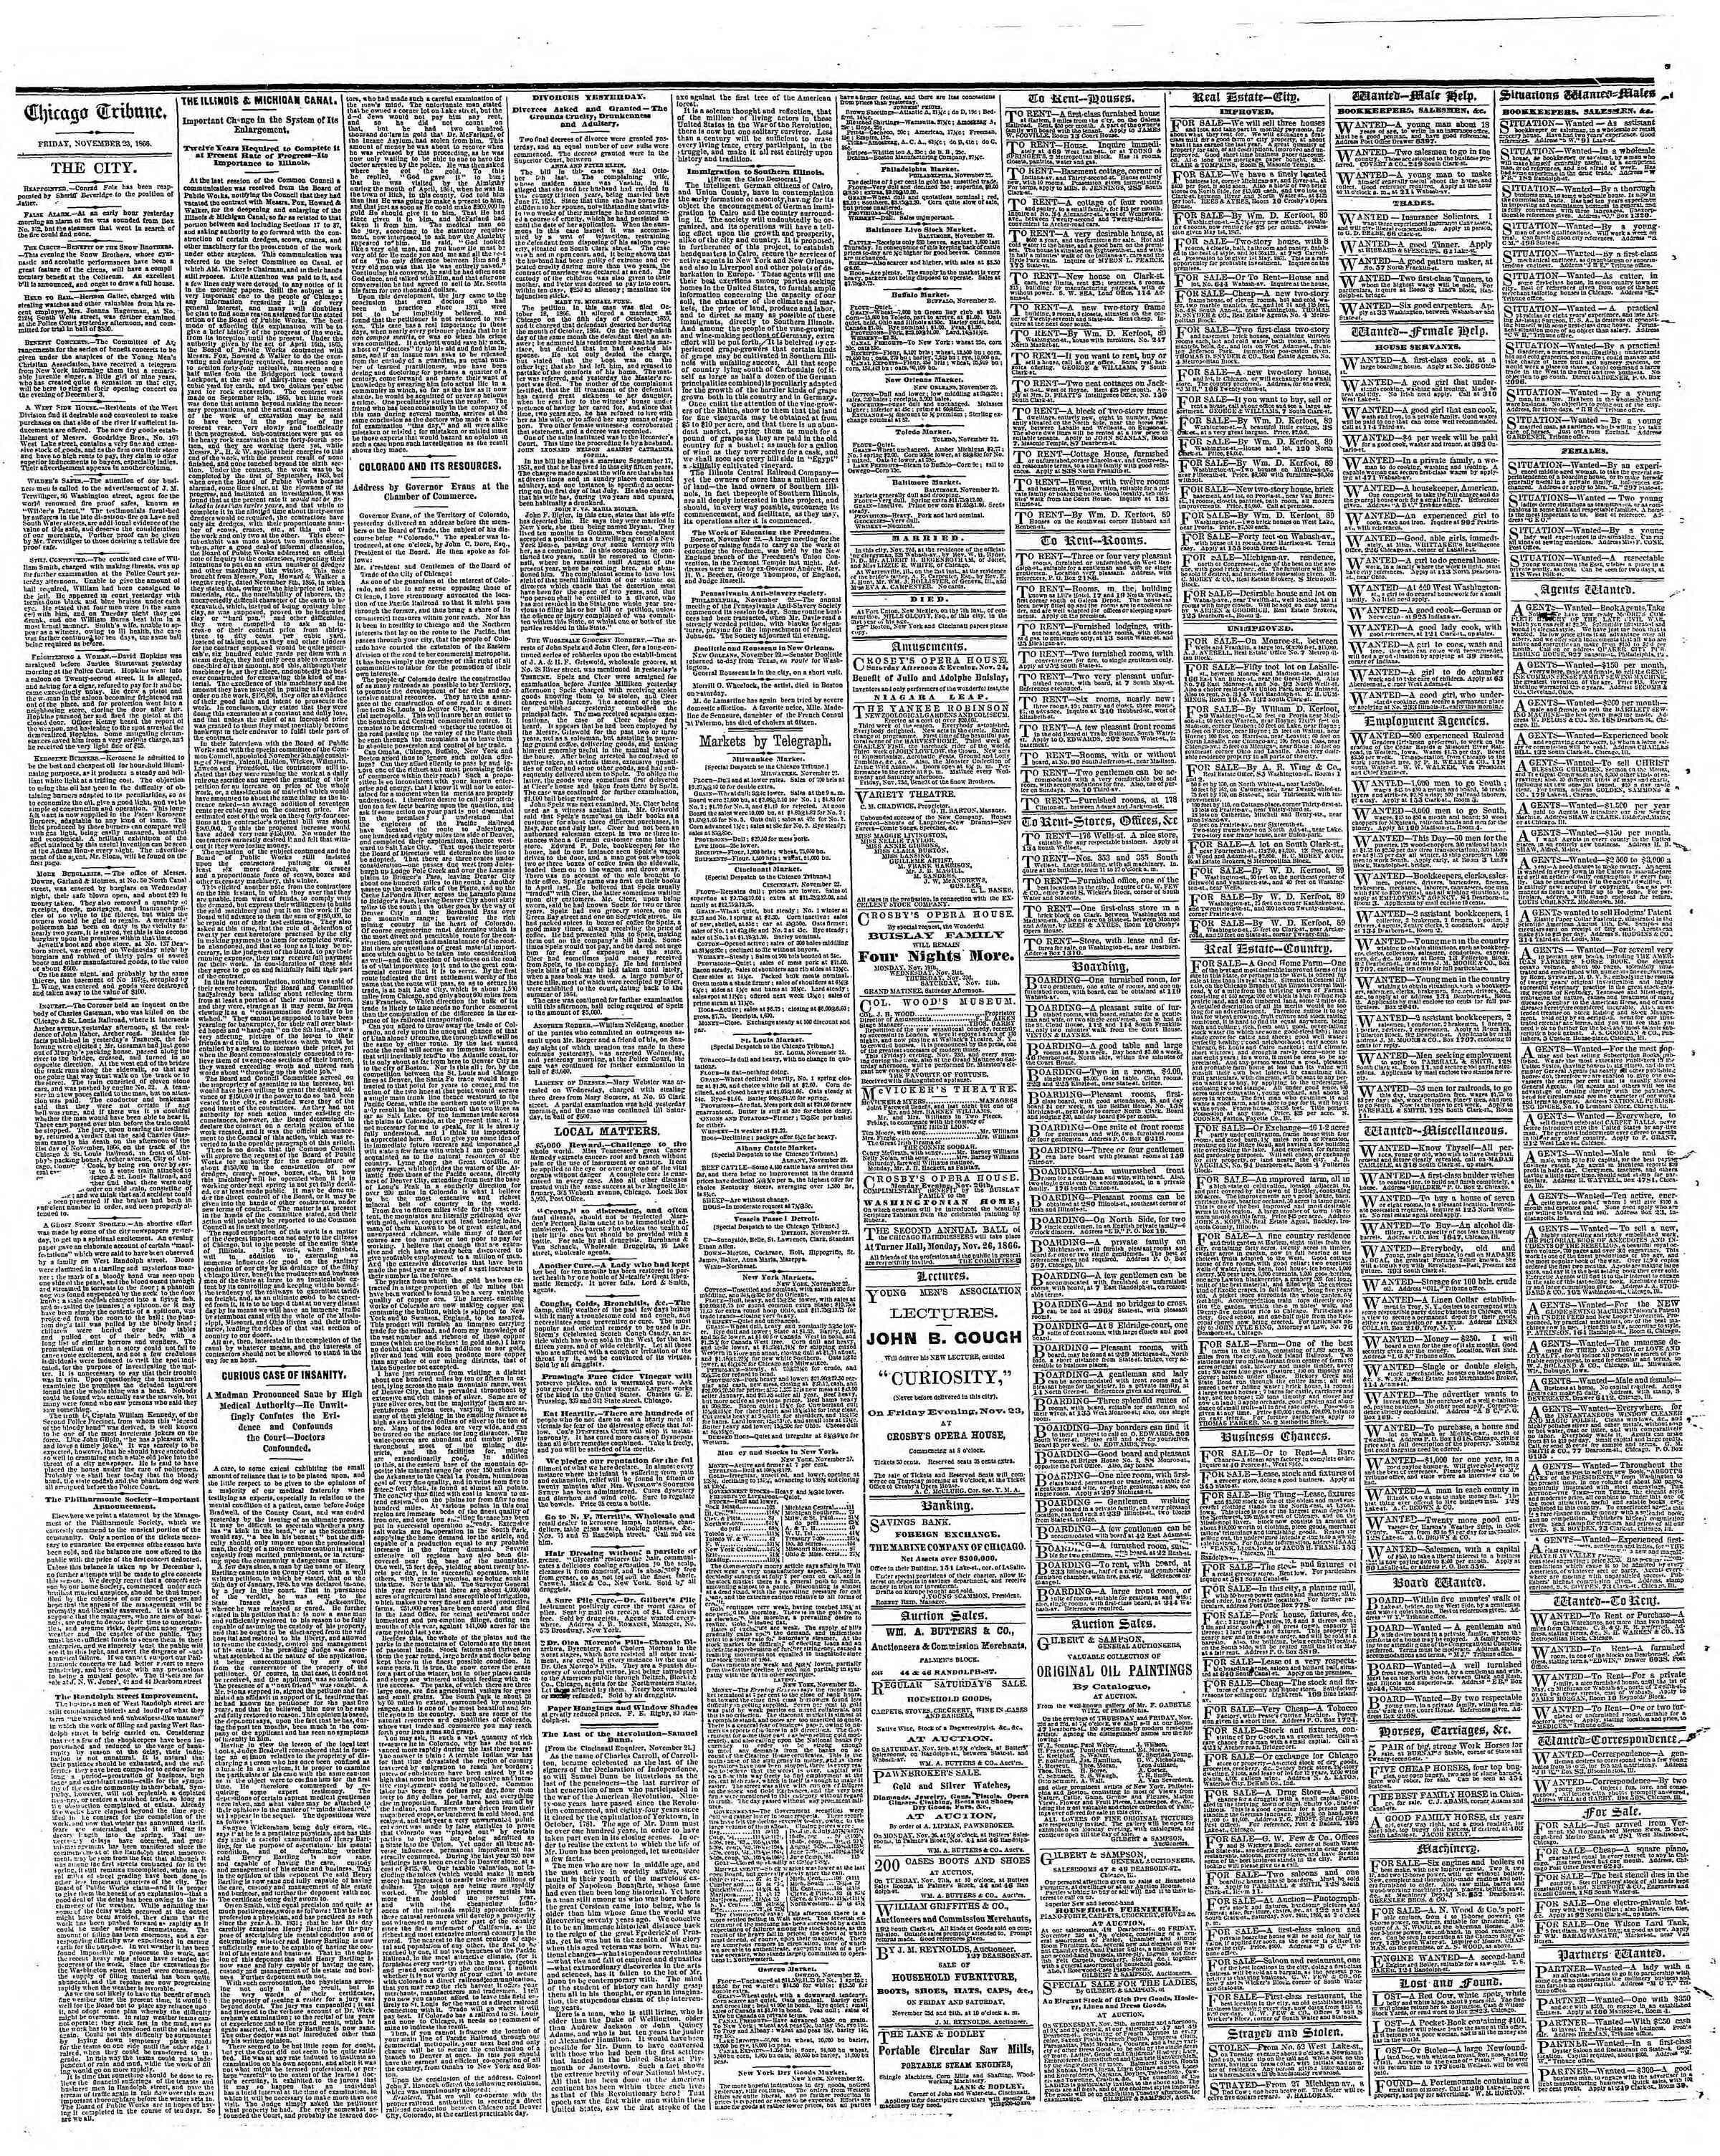 Newspaper of The Chicago Tribune dated 23 Kasım 1866 Page 4